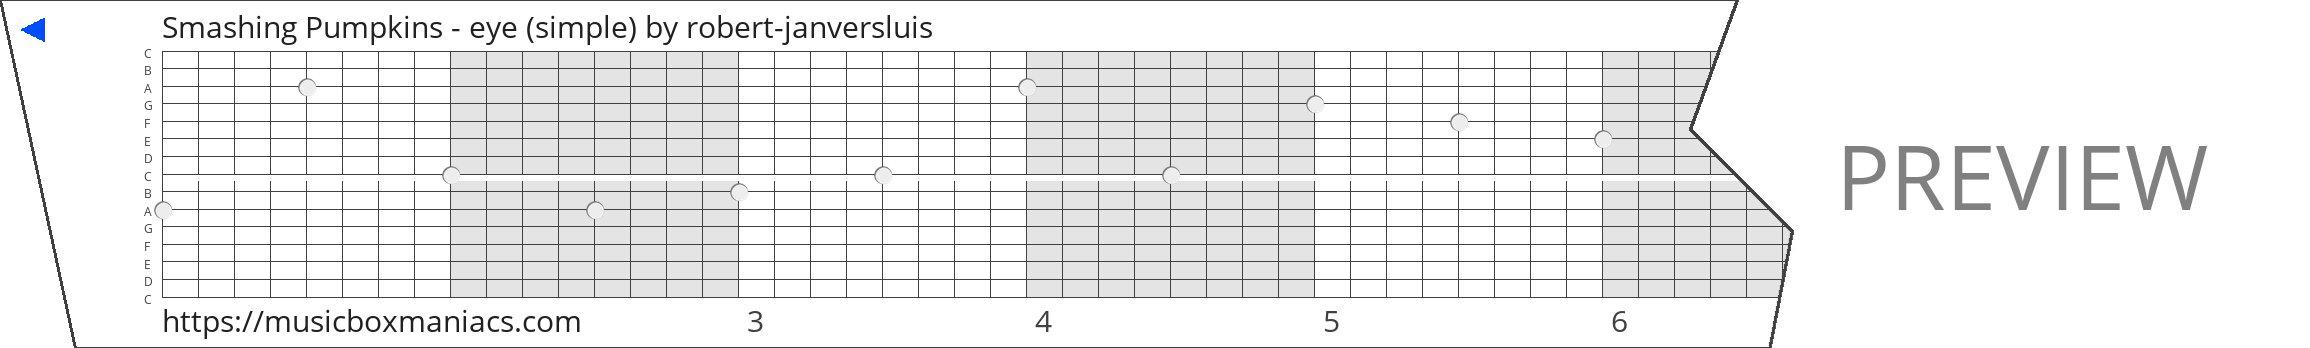 Smashing Pumpkins - eye (simple) 15 note music box paper strip